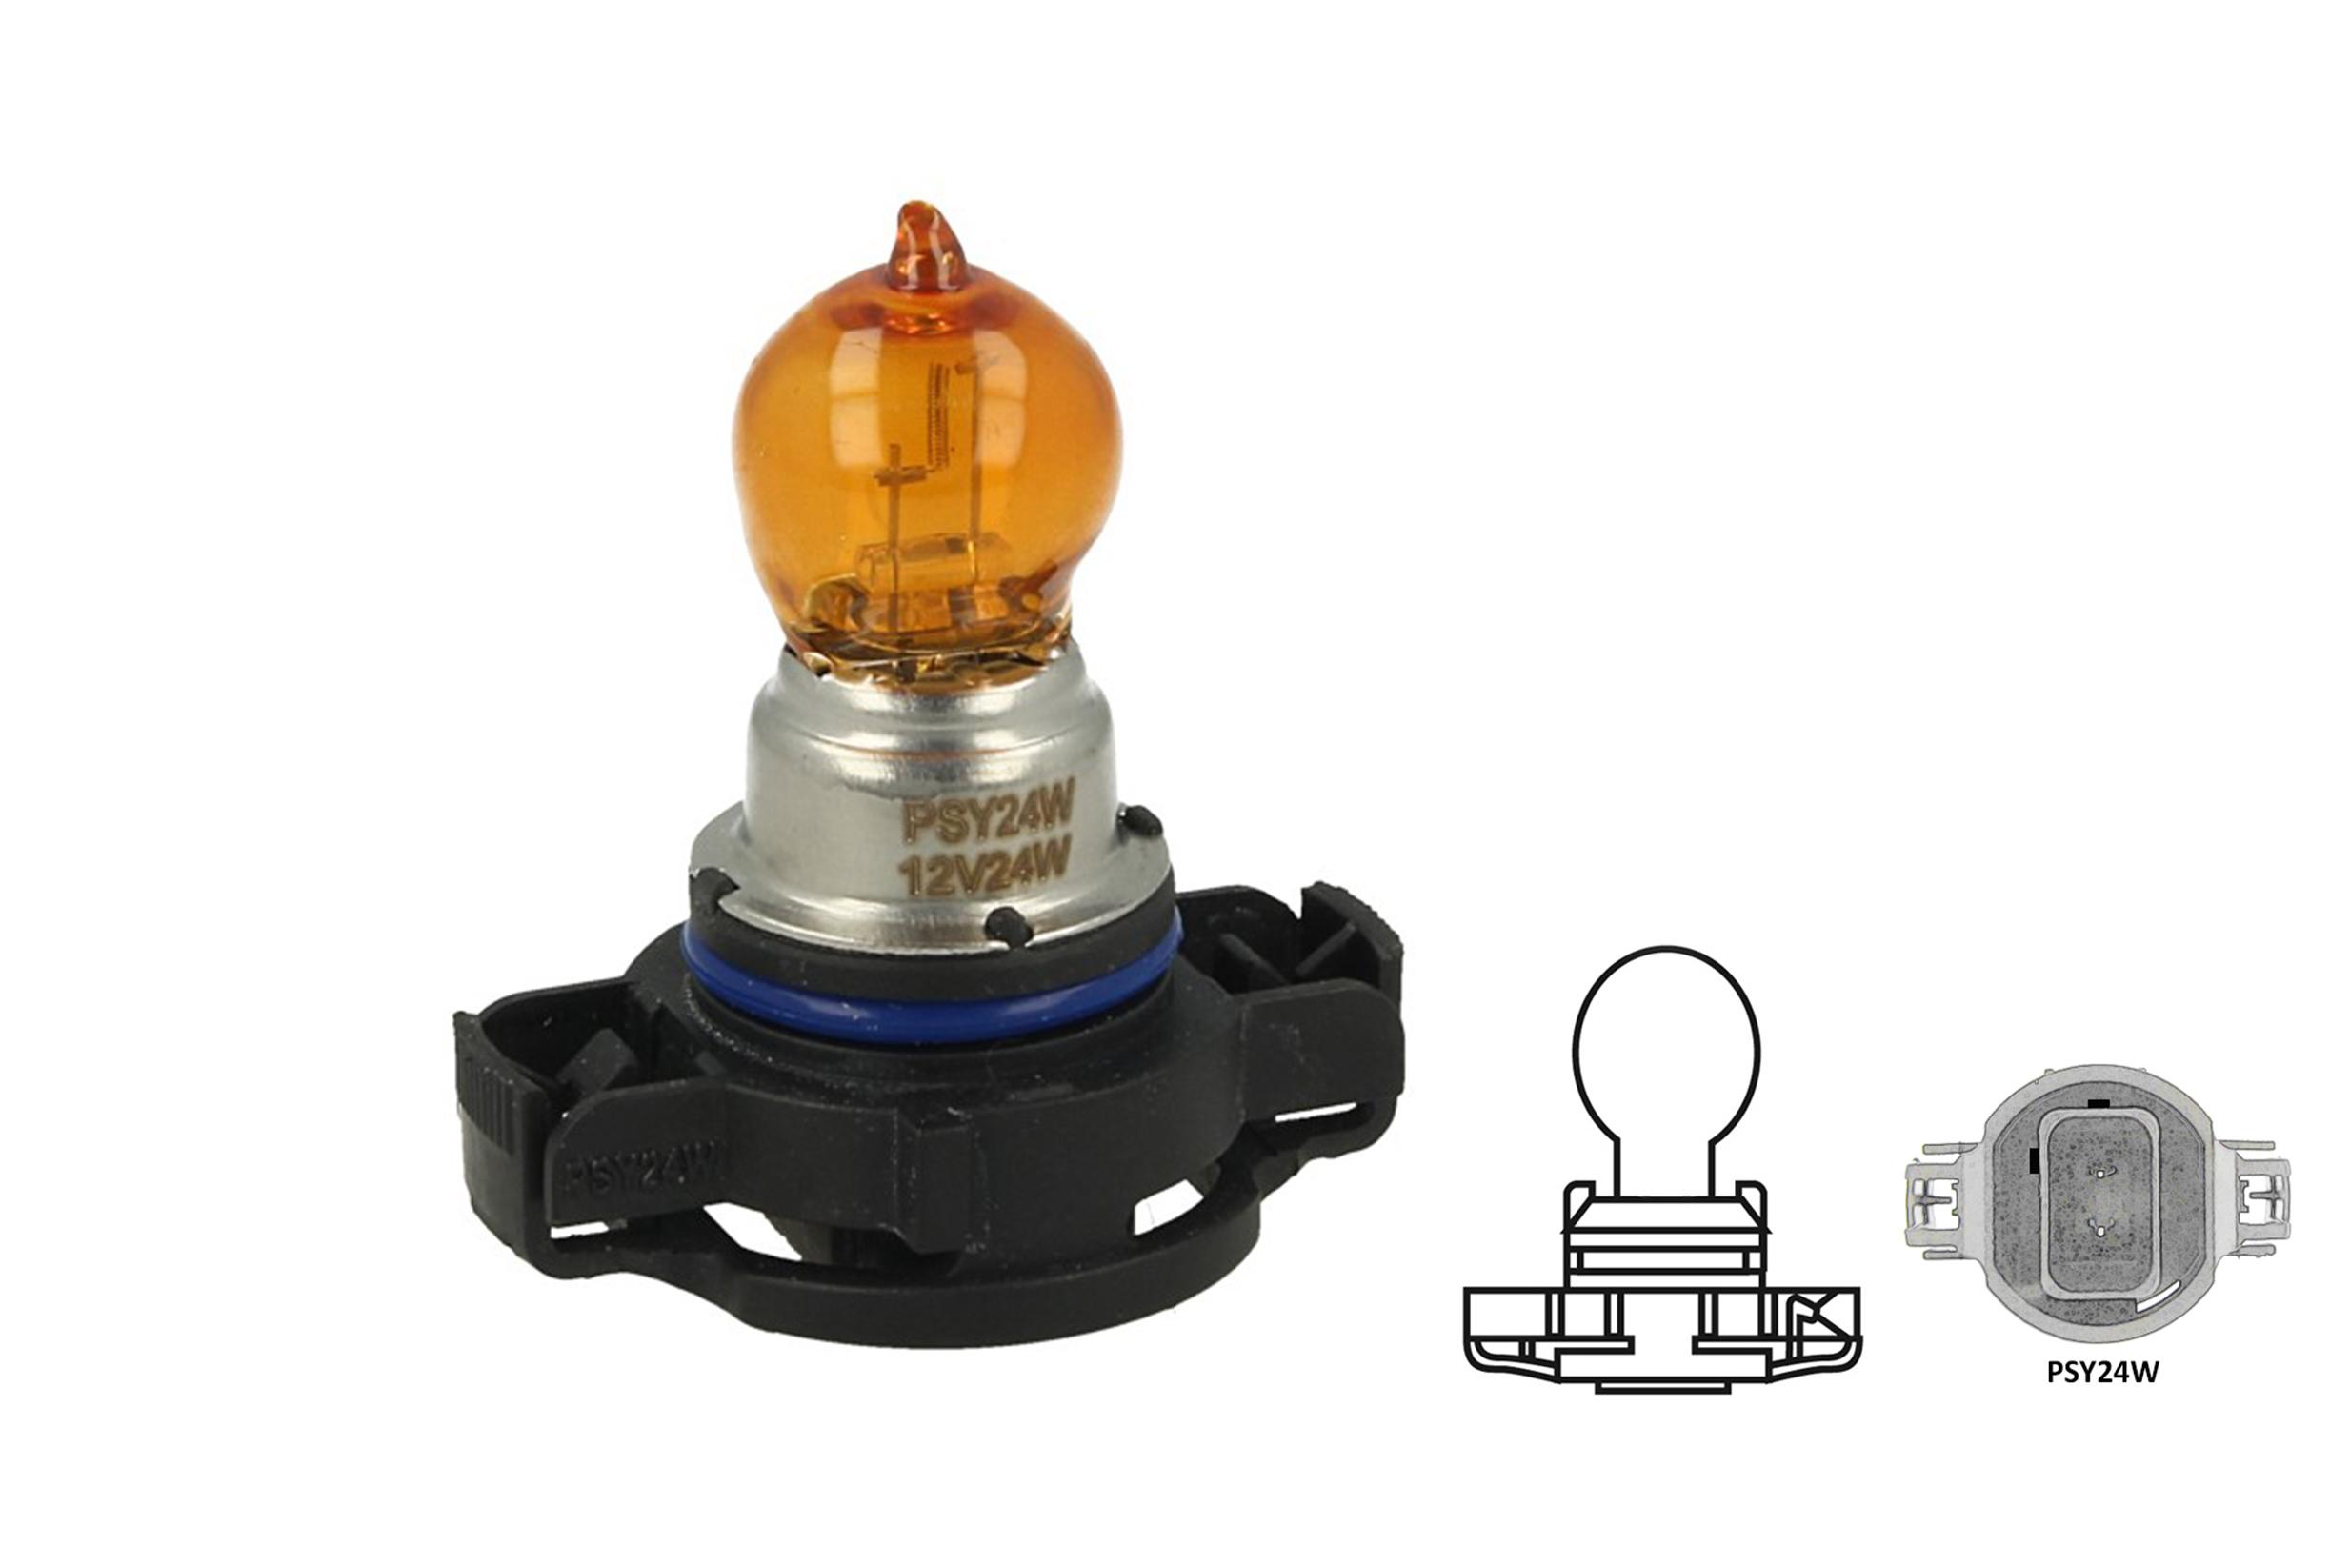 Lampada Alogena PSY24W 12V 24W PG20-4 Amber Arancione Compatibile Philips 12180SV C1 - PZ